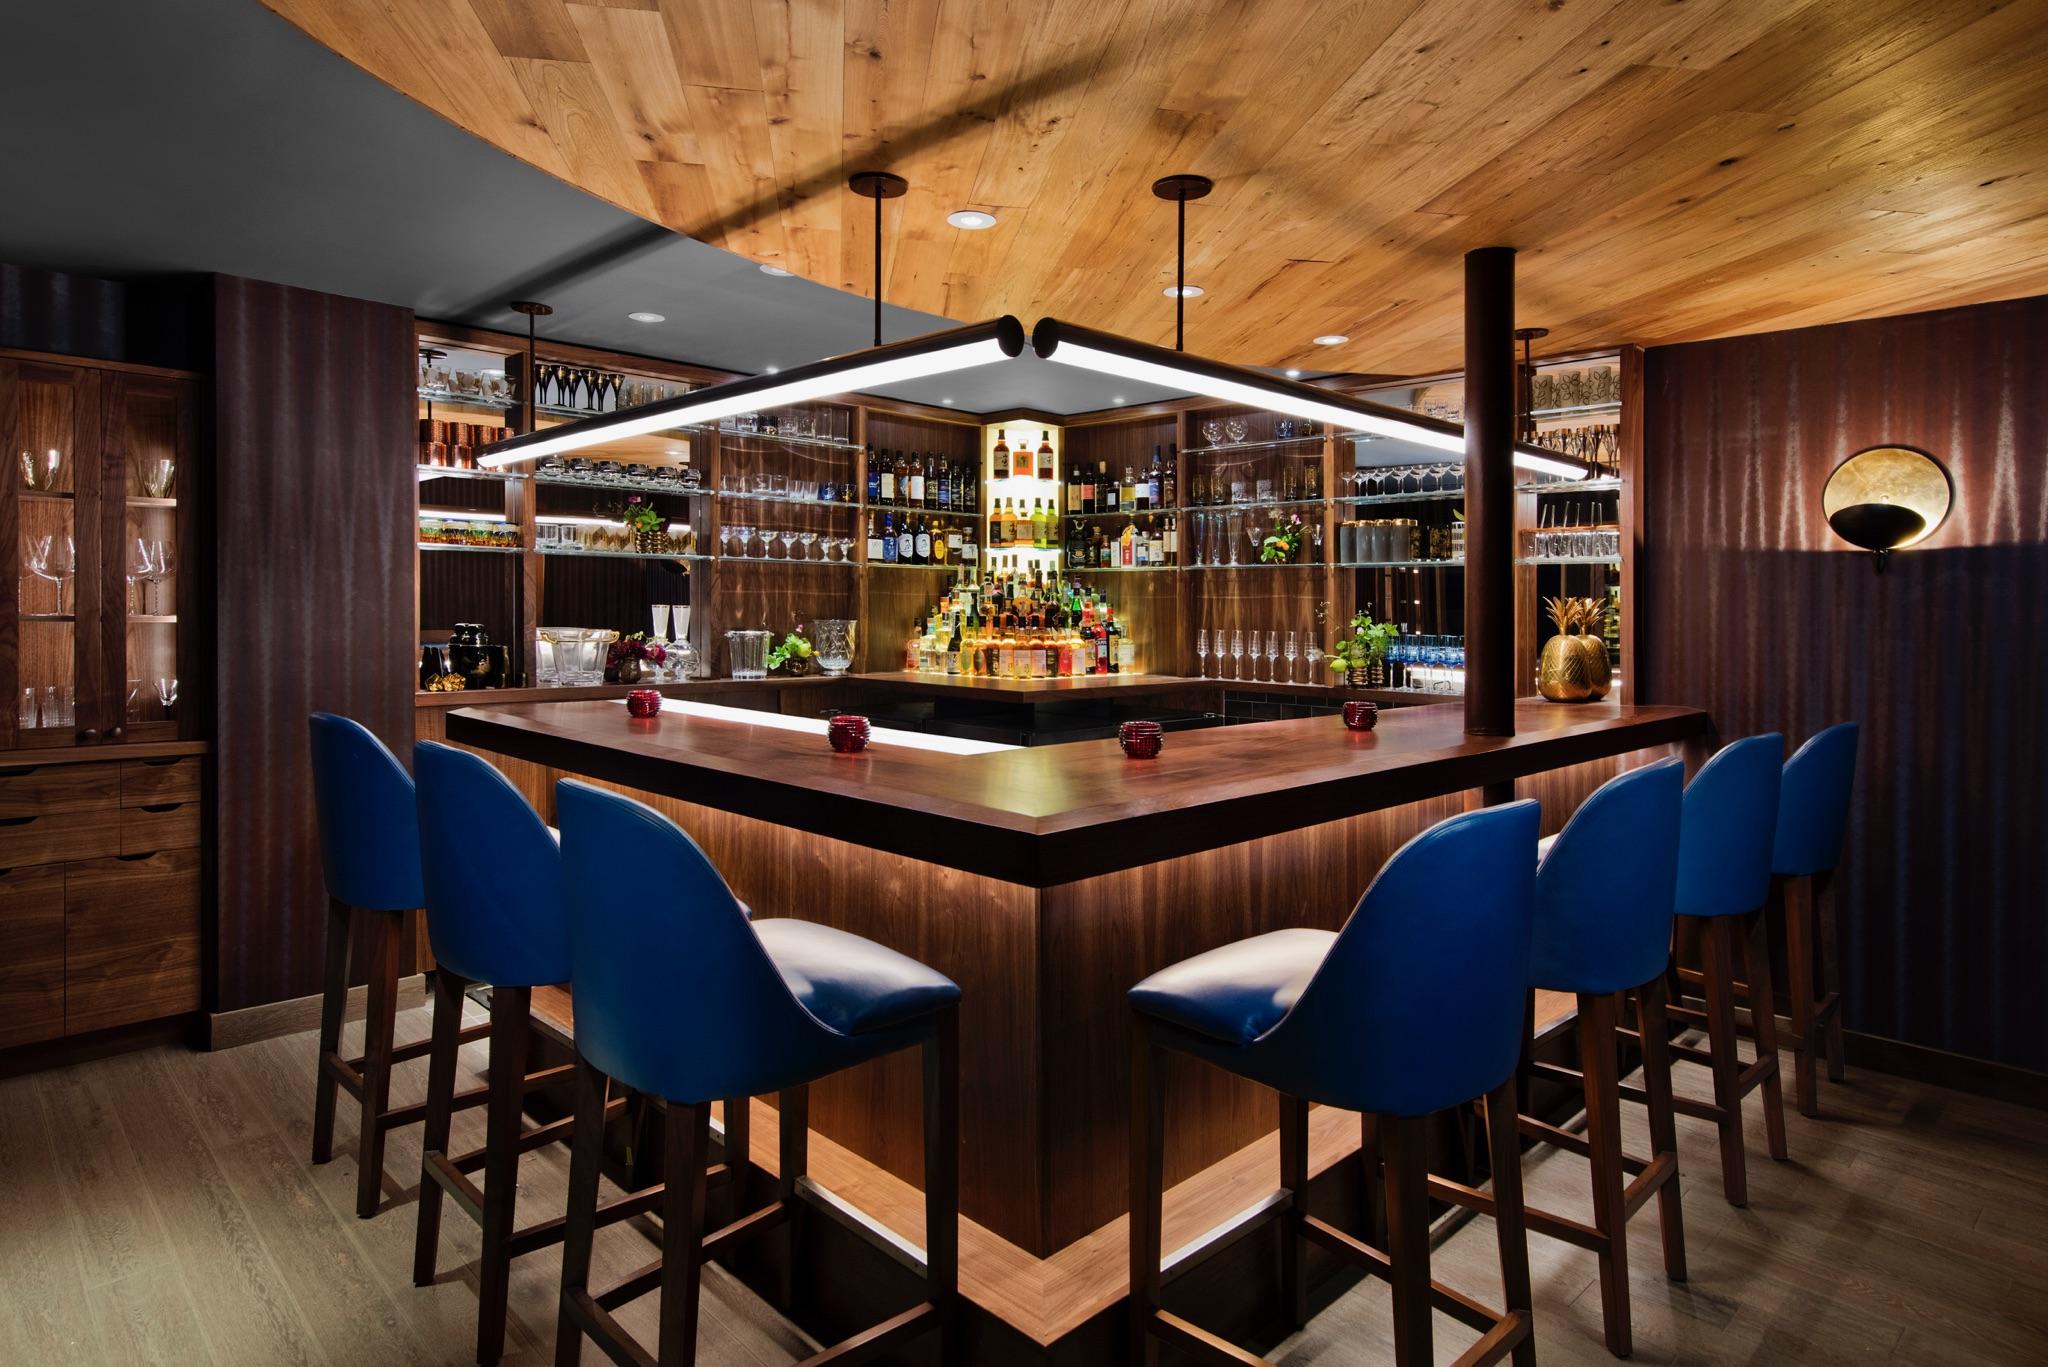 The bar at Uchu with high blue stools